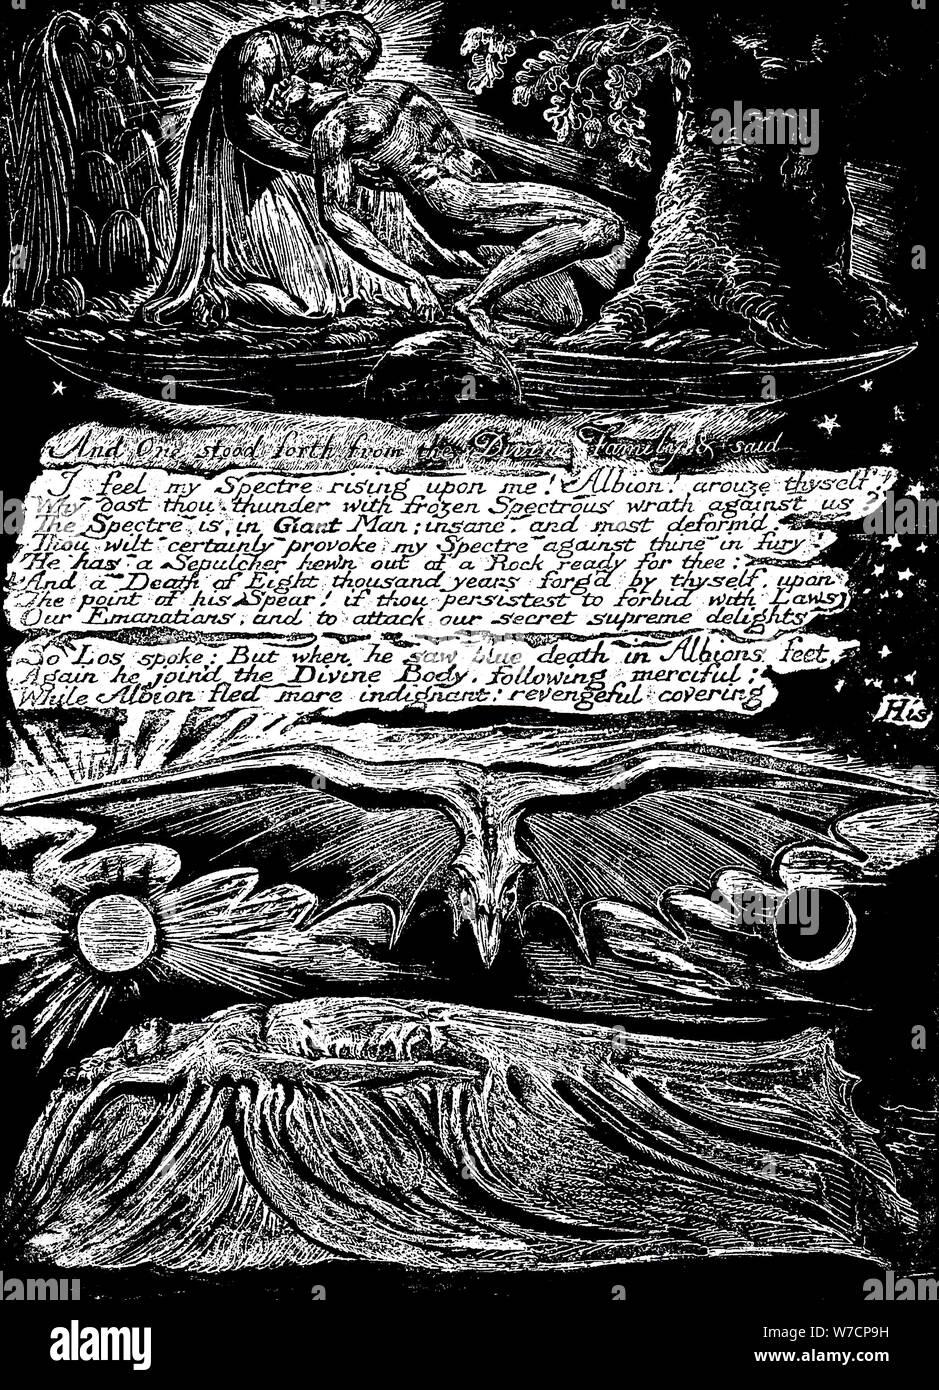 William Blake 1757 1827 English Mystic Poet Painter And